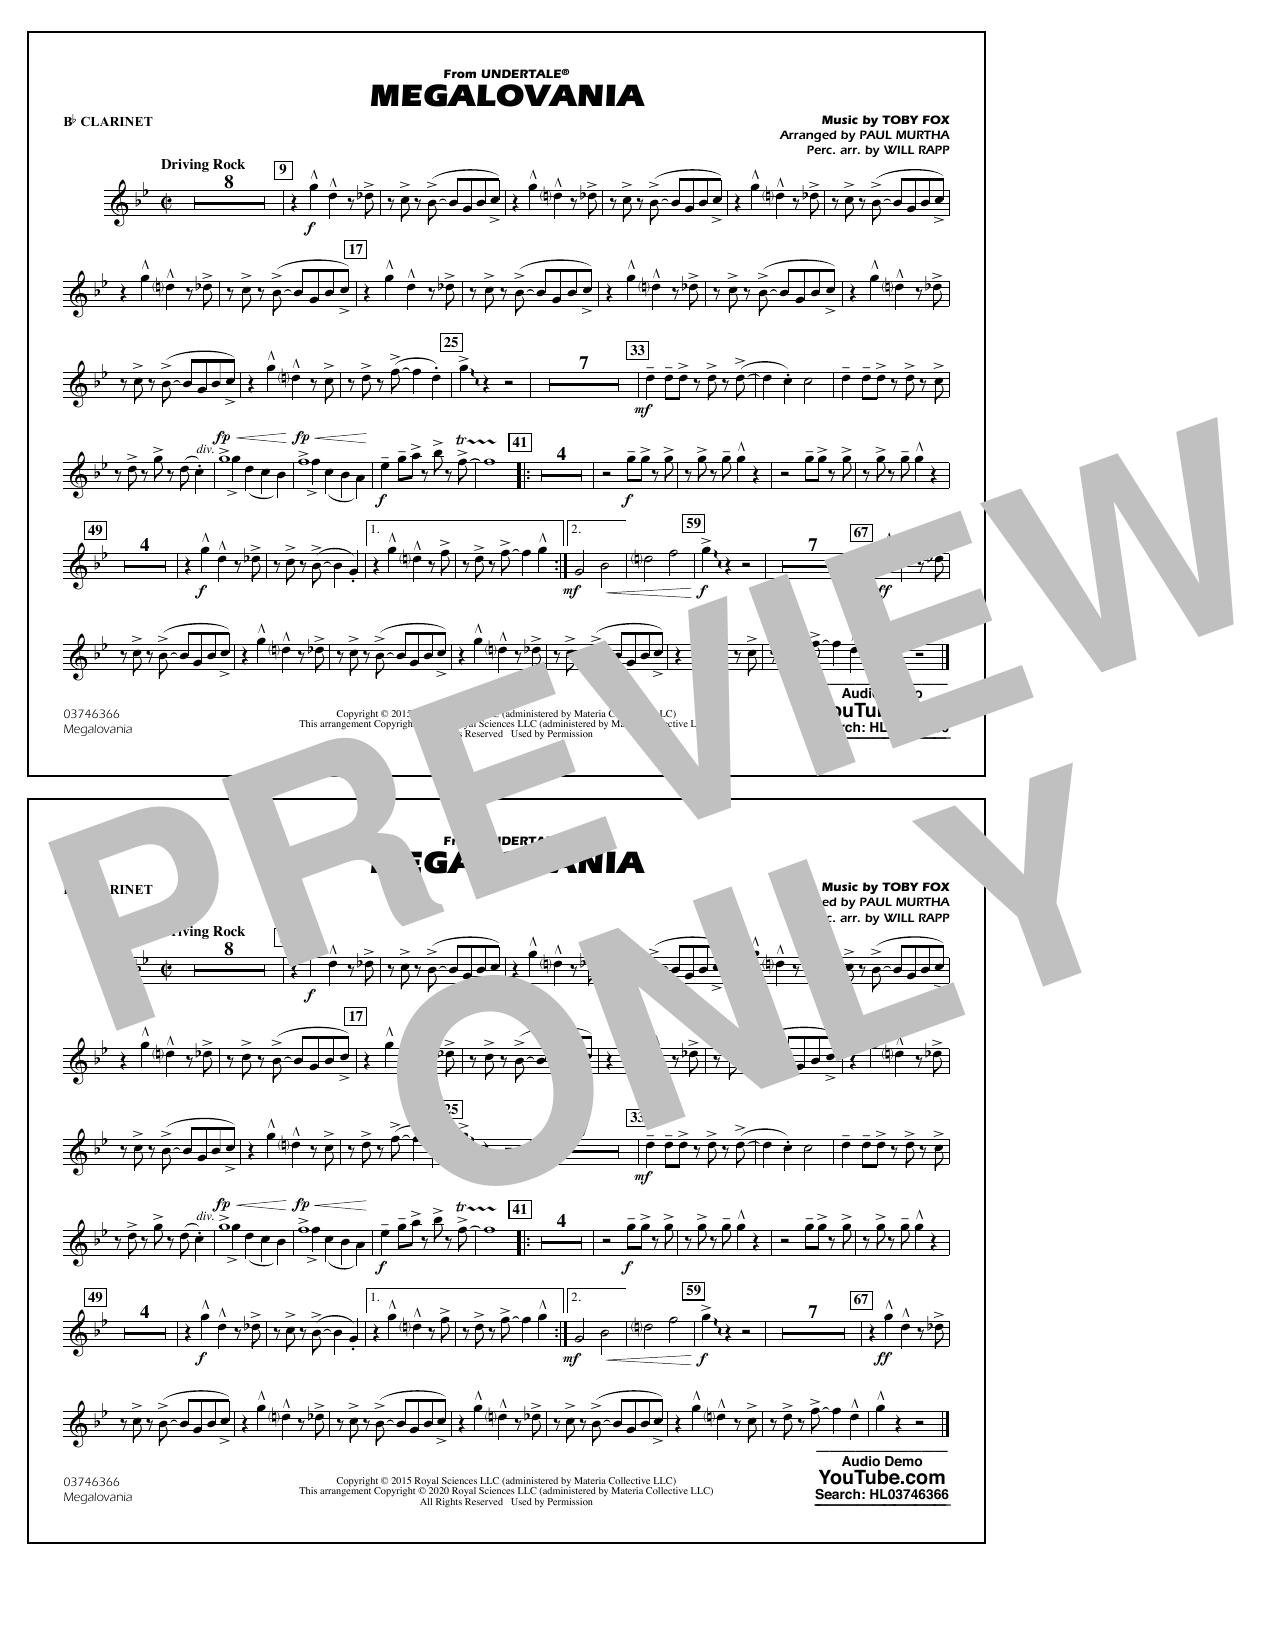 Megalovania (from Undertale) (arr. Paul Murtha) - Bb Clarinet Sheet Music